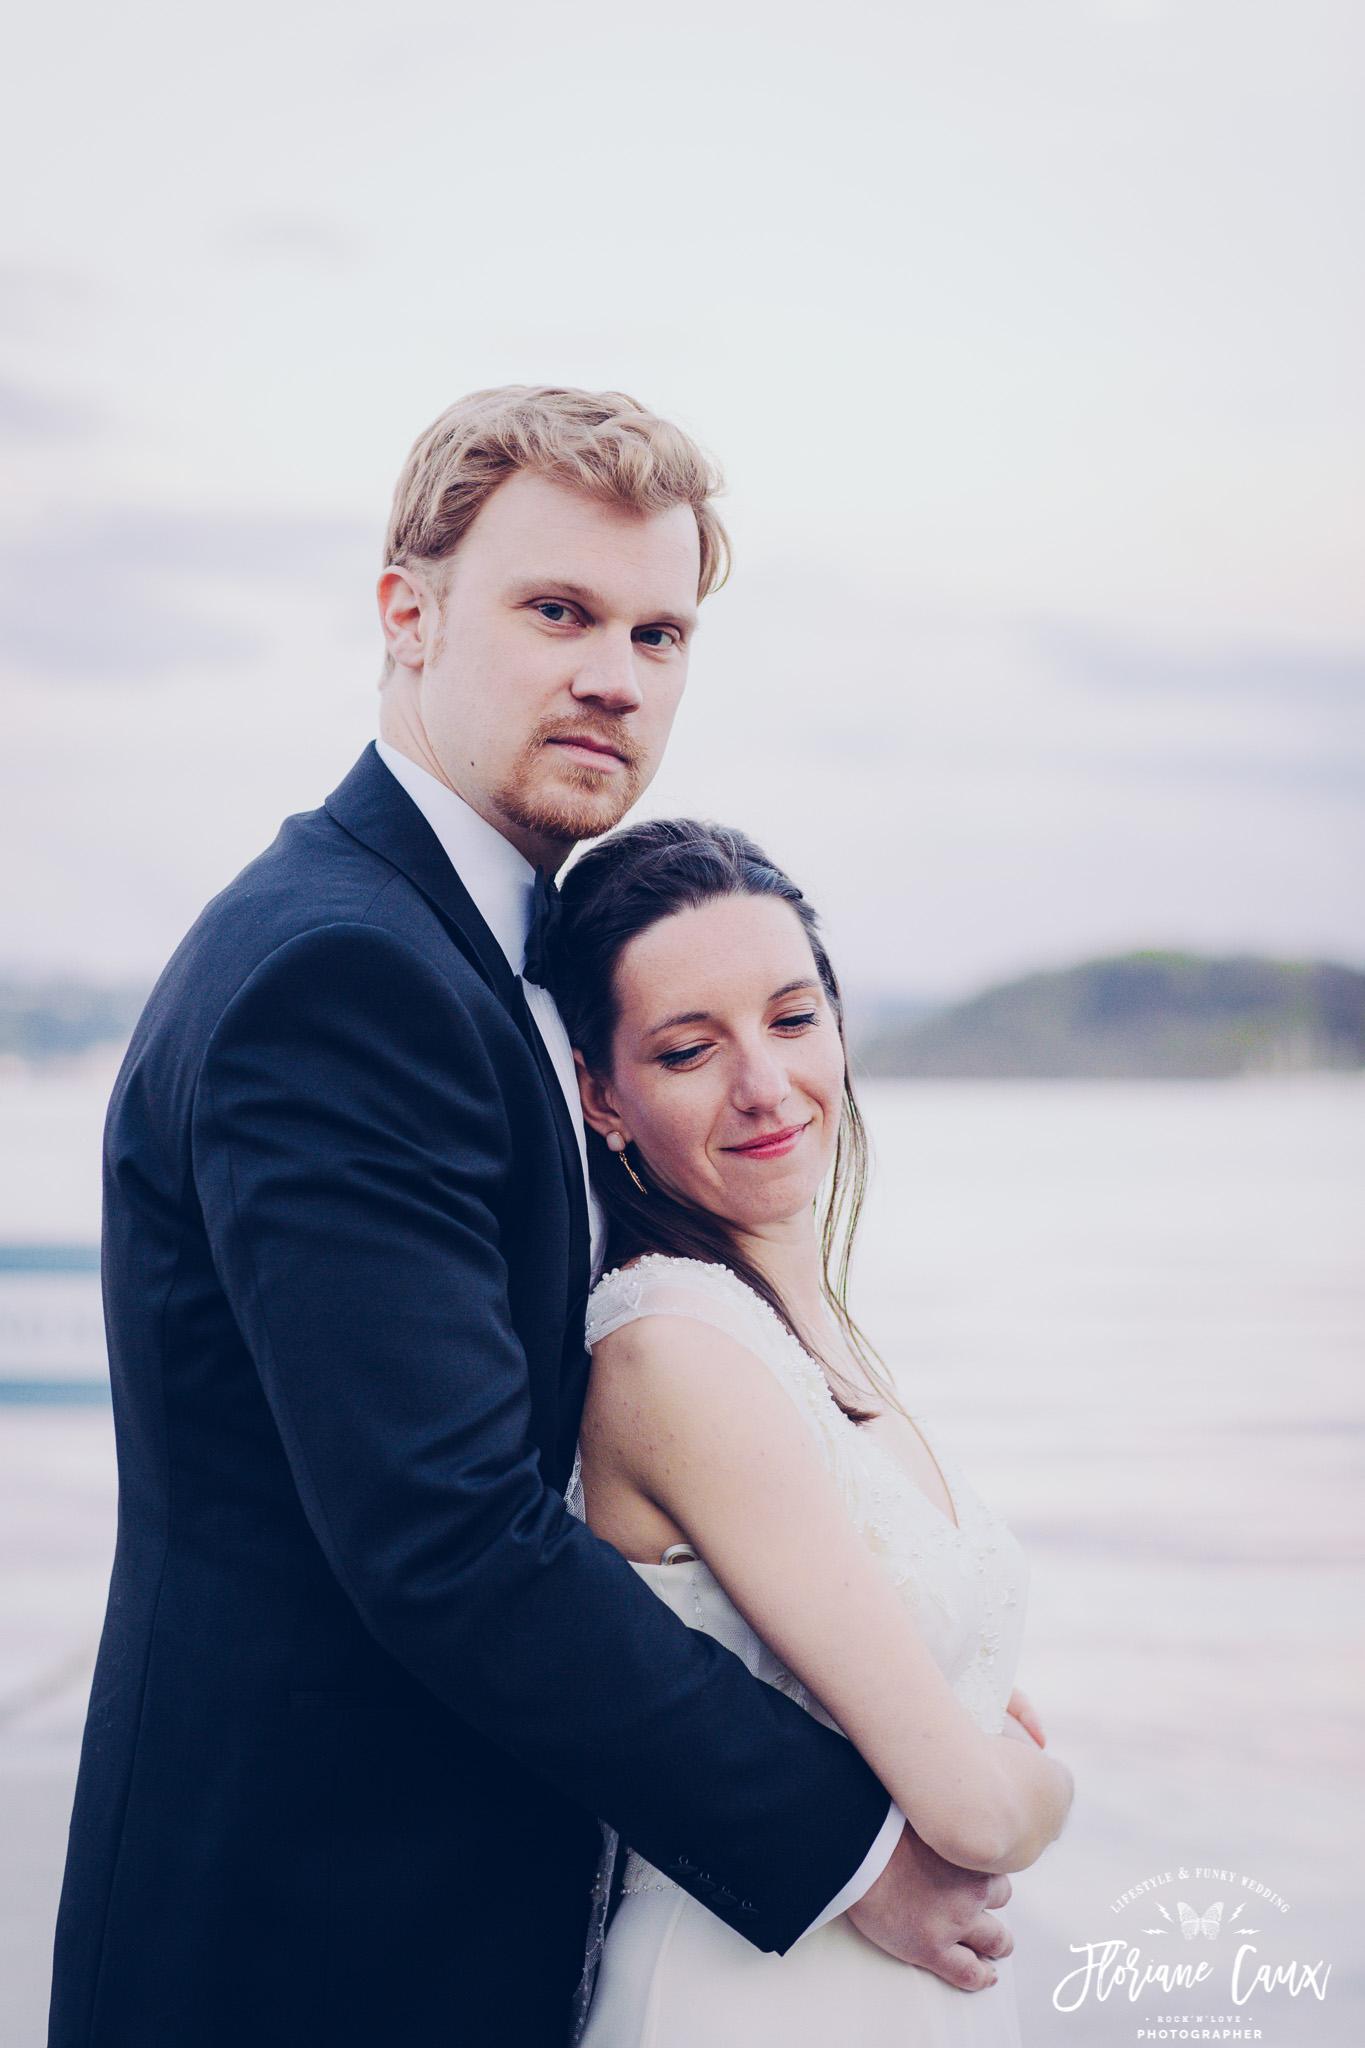 destination-wedding-photographer-oslo-norway-floriane-caux-52